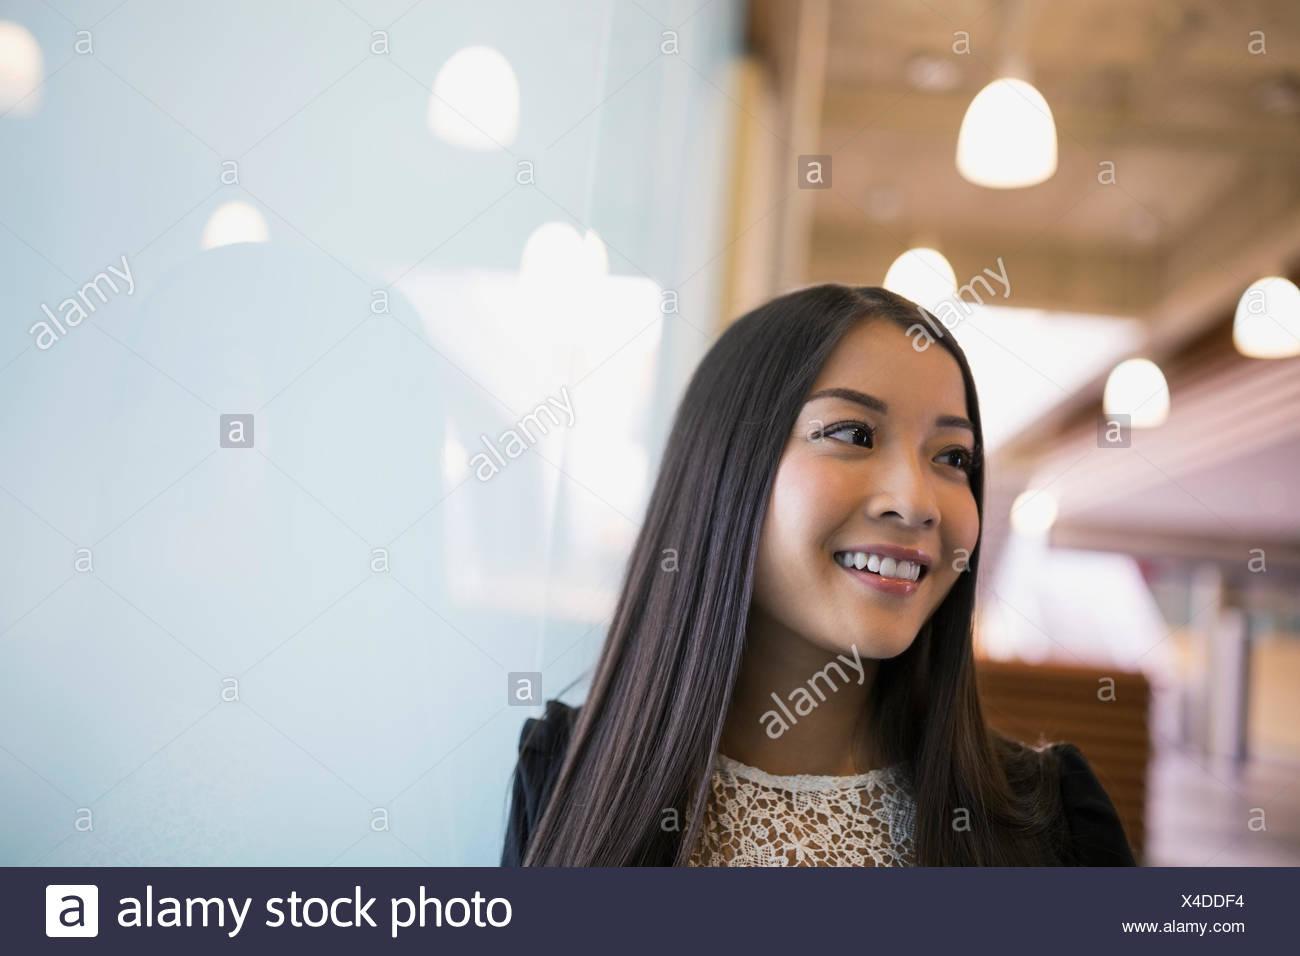 Smiling woman looking away - Stock Image